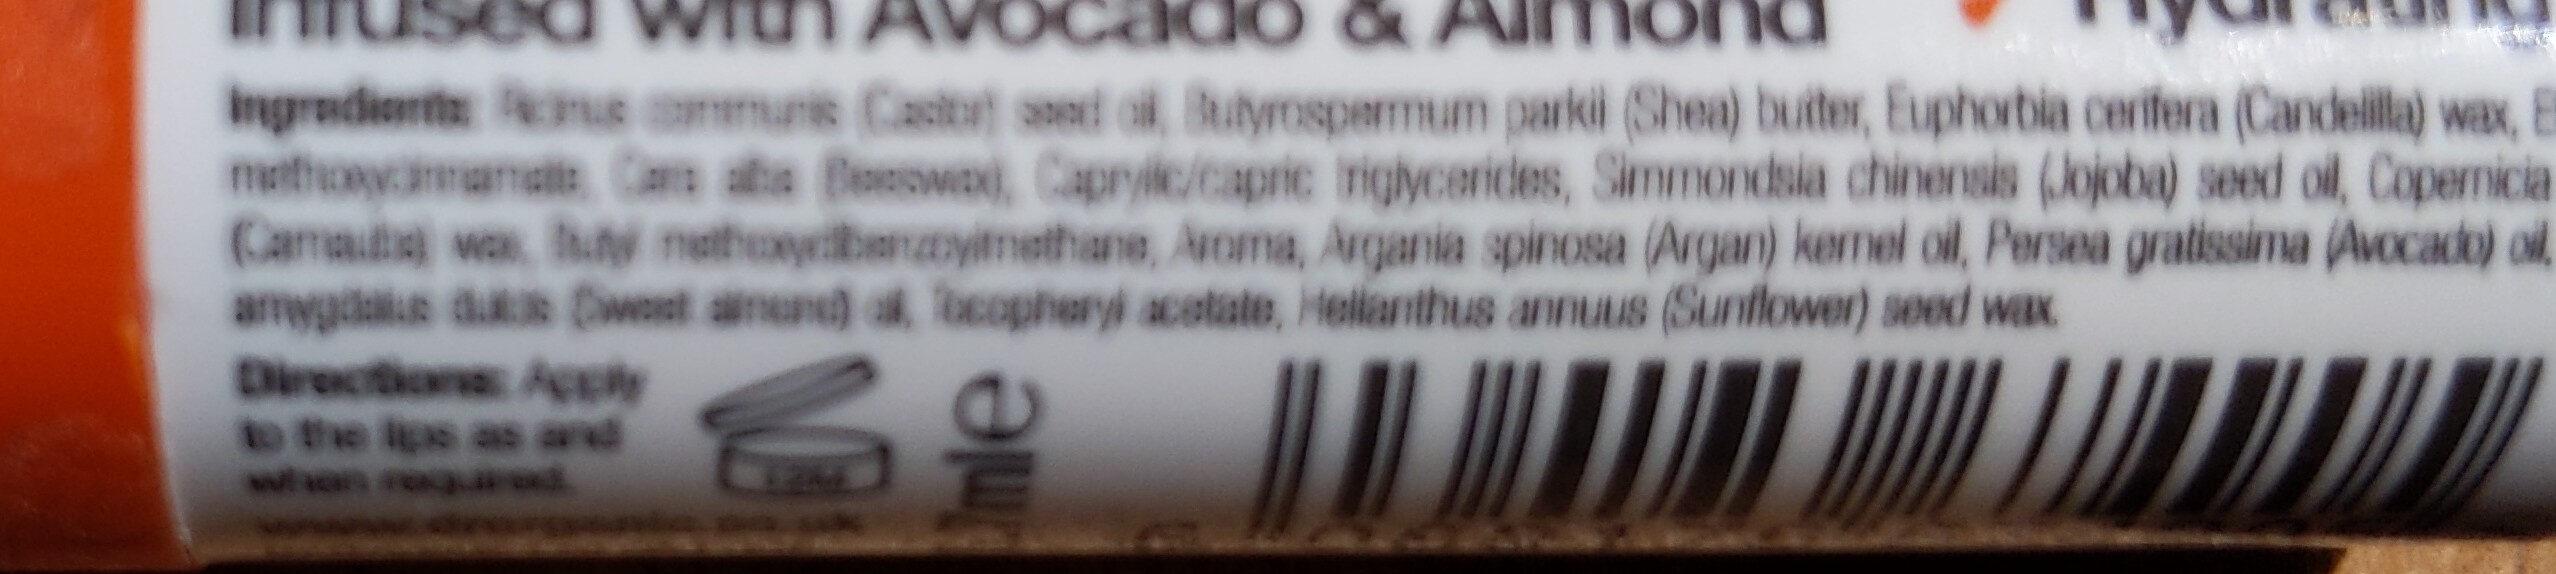 Organic Moroccan Argan Oil - Ingredients - en